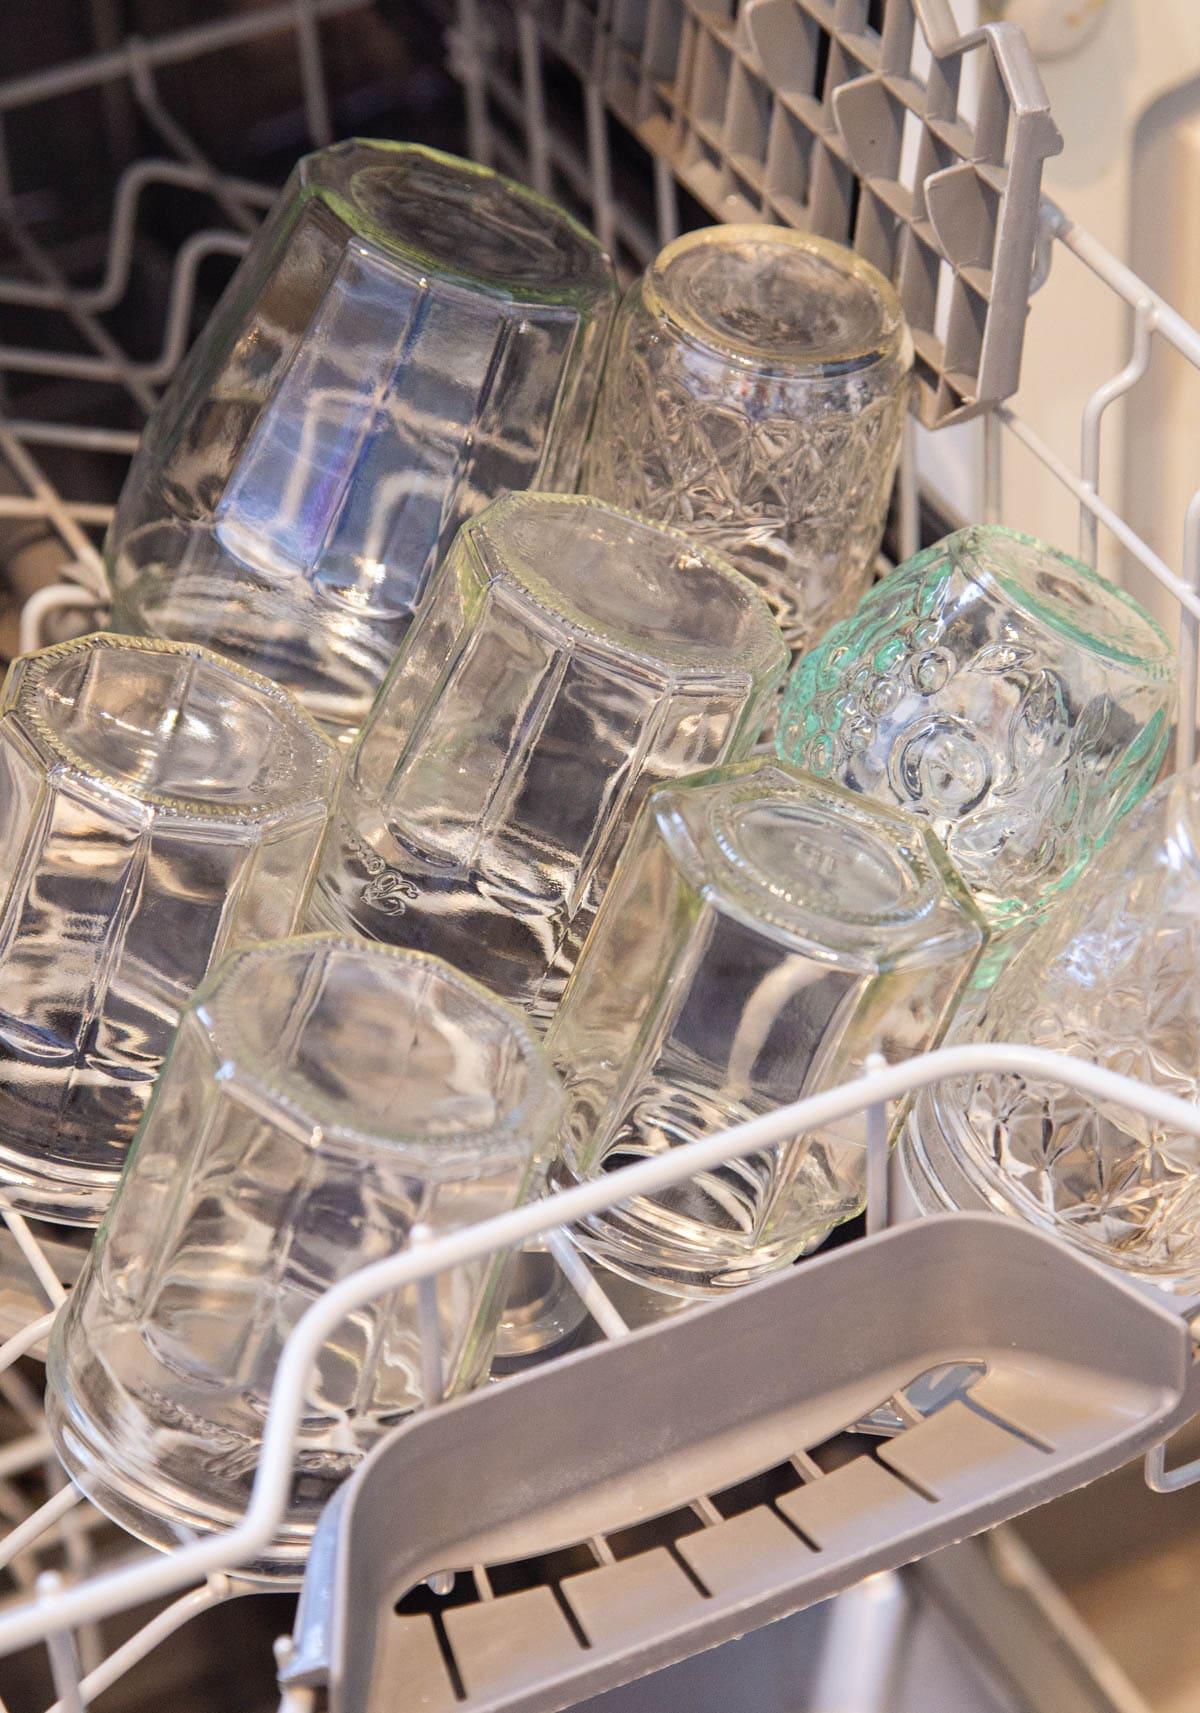 Upside down glass jam jars on the basket on the dishwasher